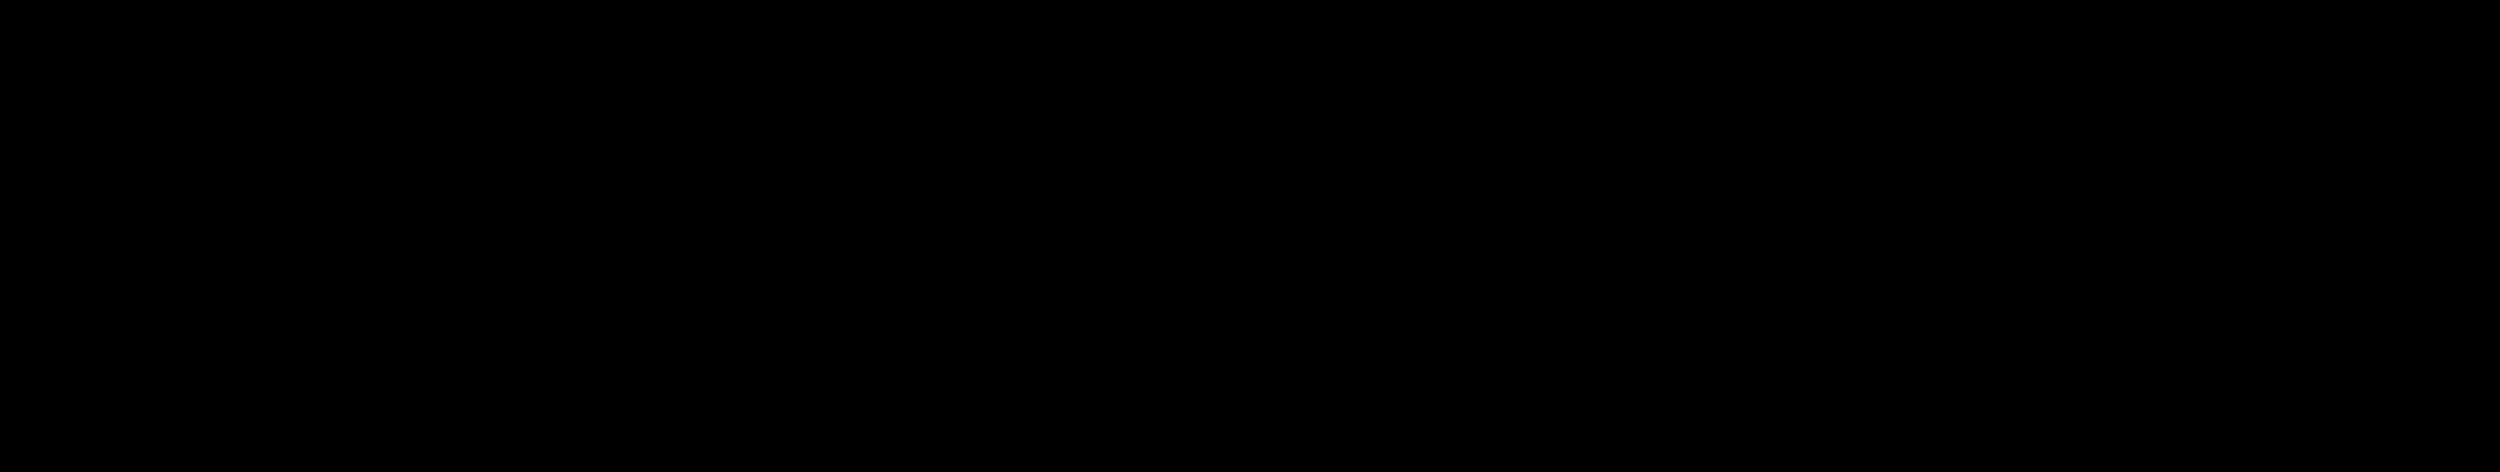 Logo Large Black